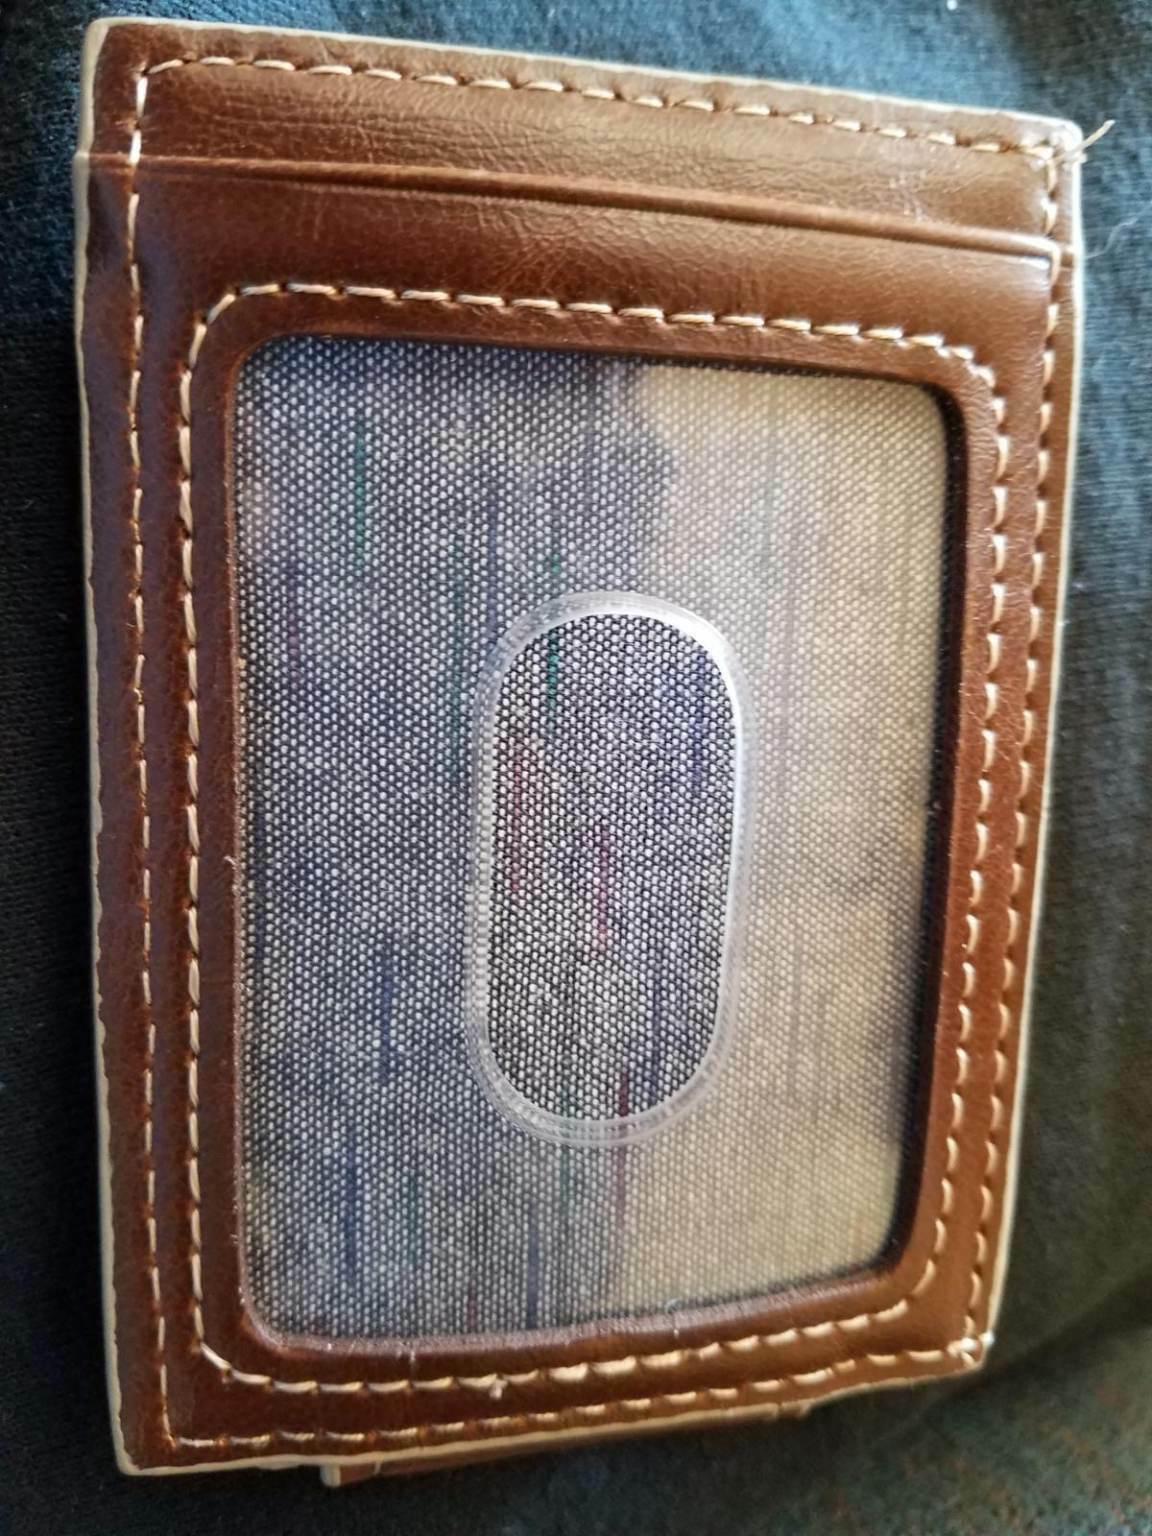 Dockers Slim Series Front Pocket Wallet w/ Magnetic Case